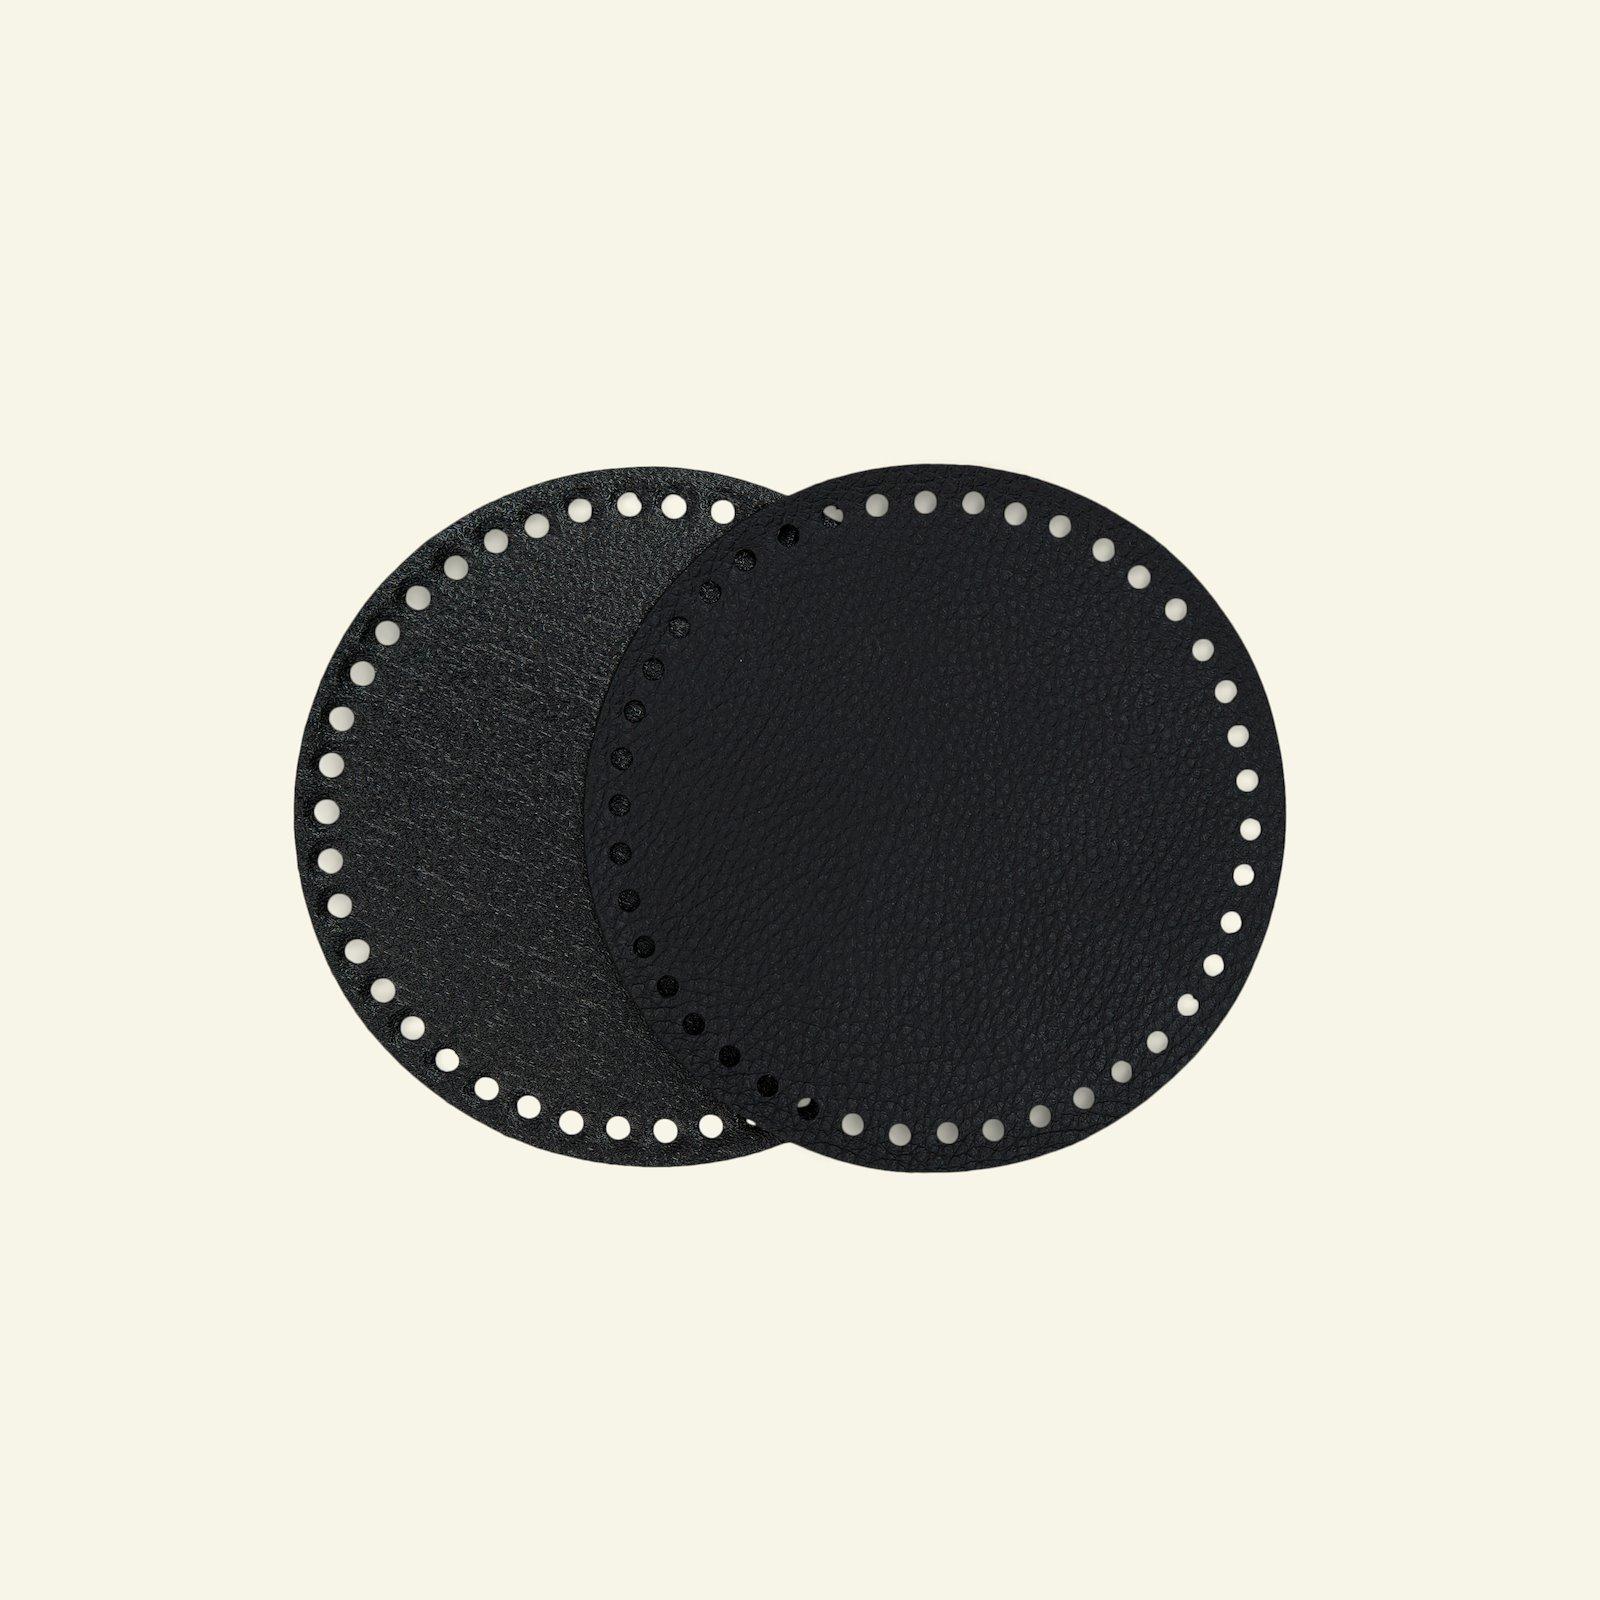 FRAYA bag/basket bottom 16cm black 1pc 83309_pack